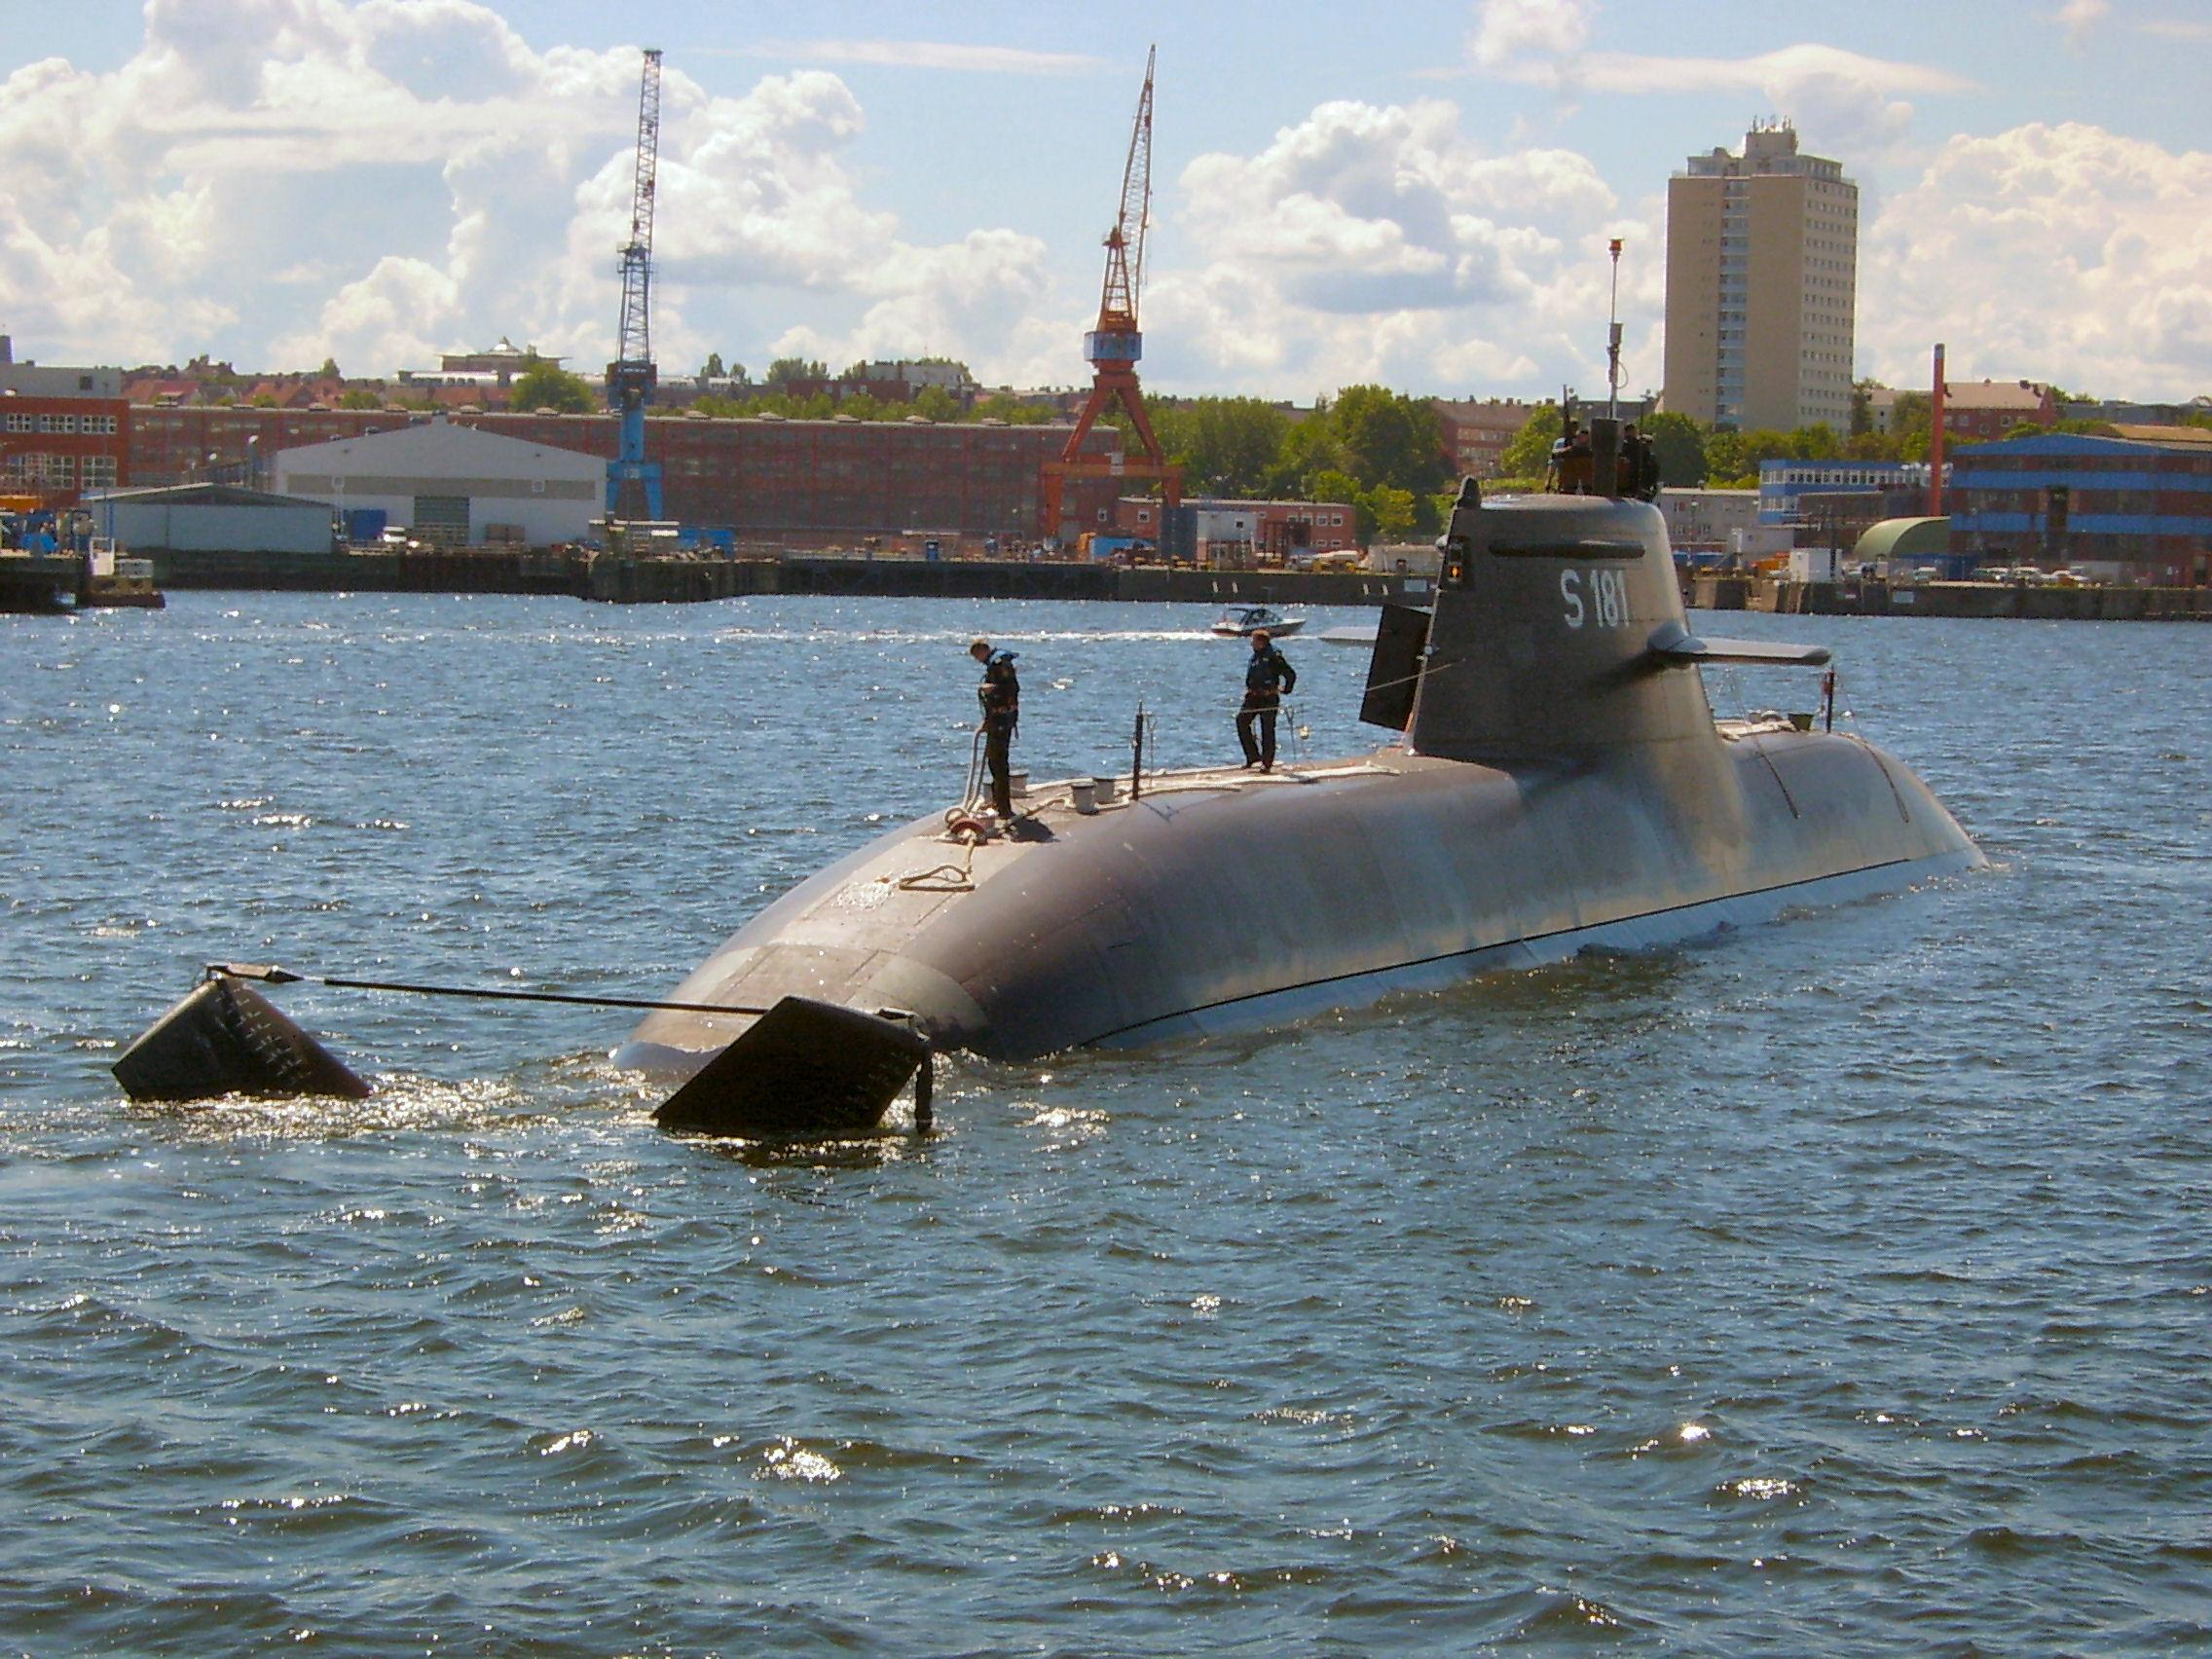 German submarine U-31 (S181) - Wikipedia